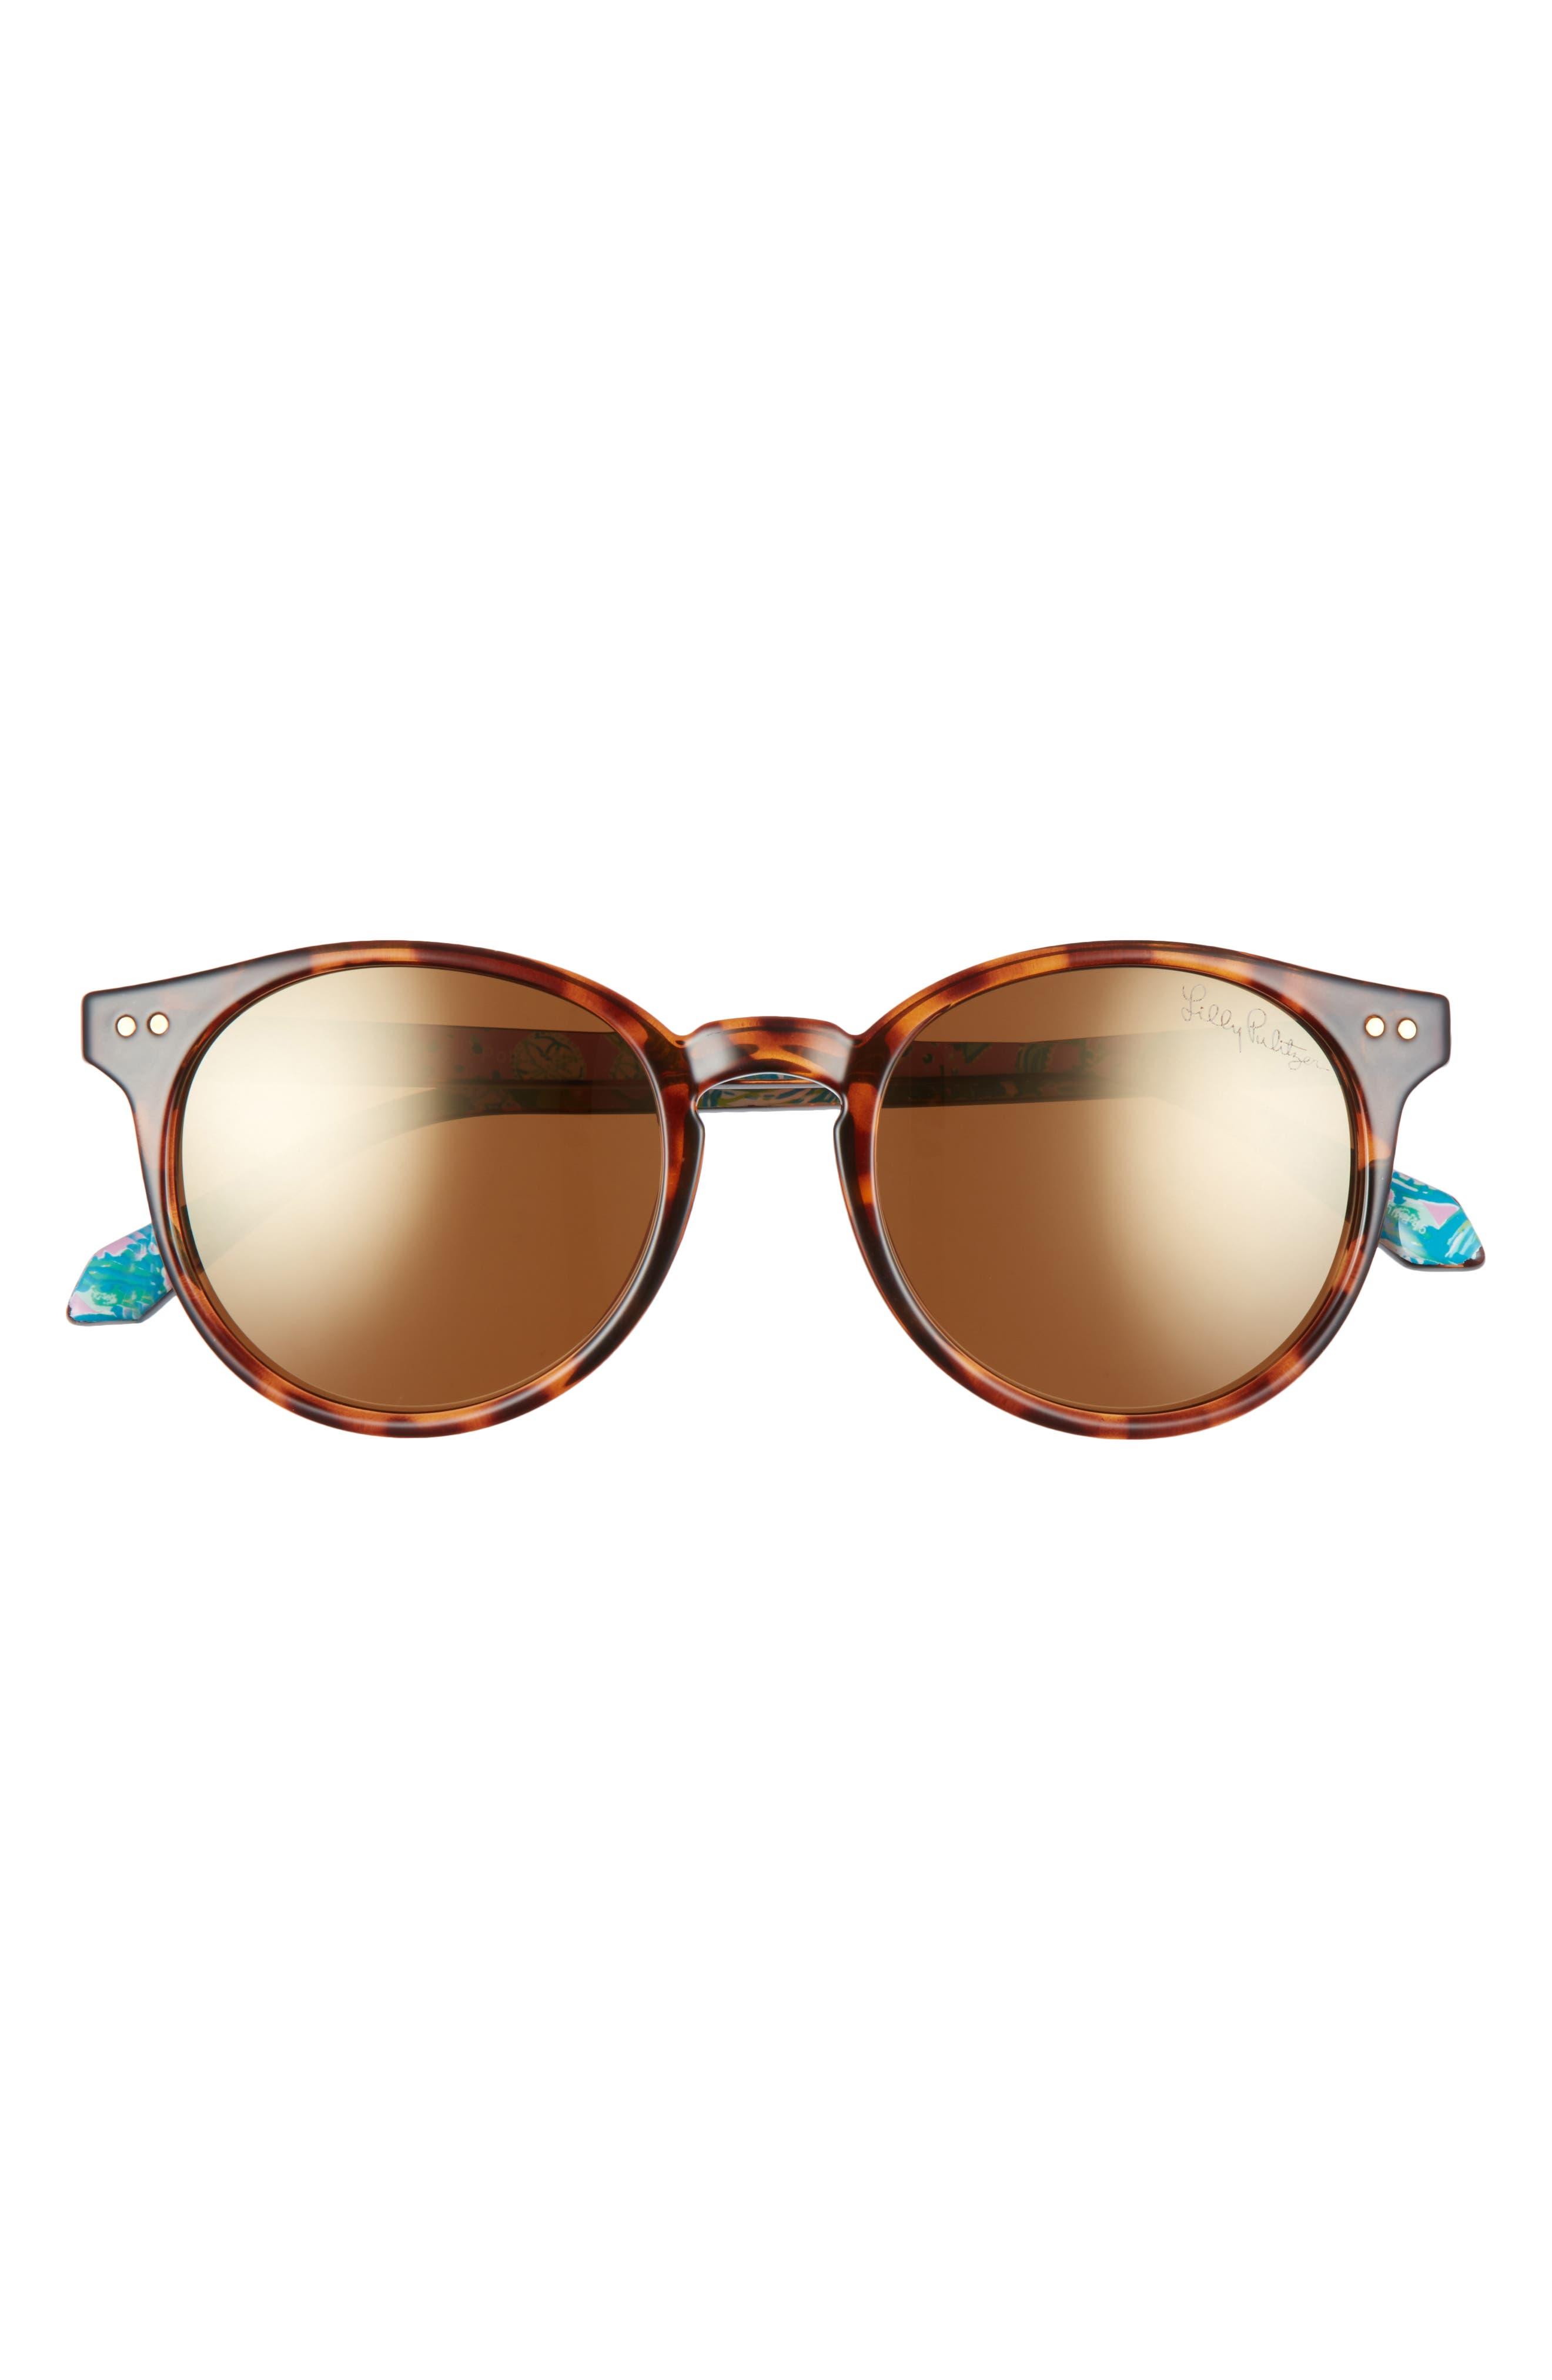 Women's Lilly Pulitzer Elodie 50mm Polarized Round Sunglasses